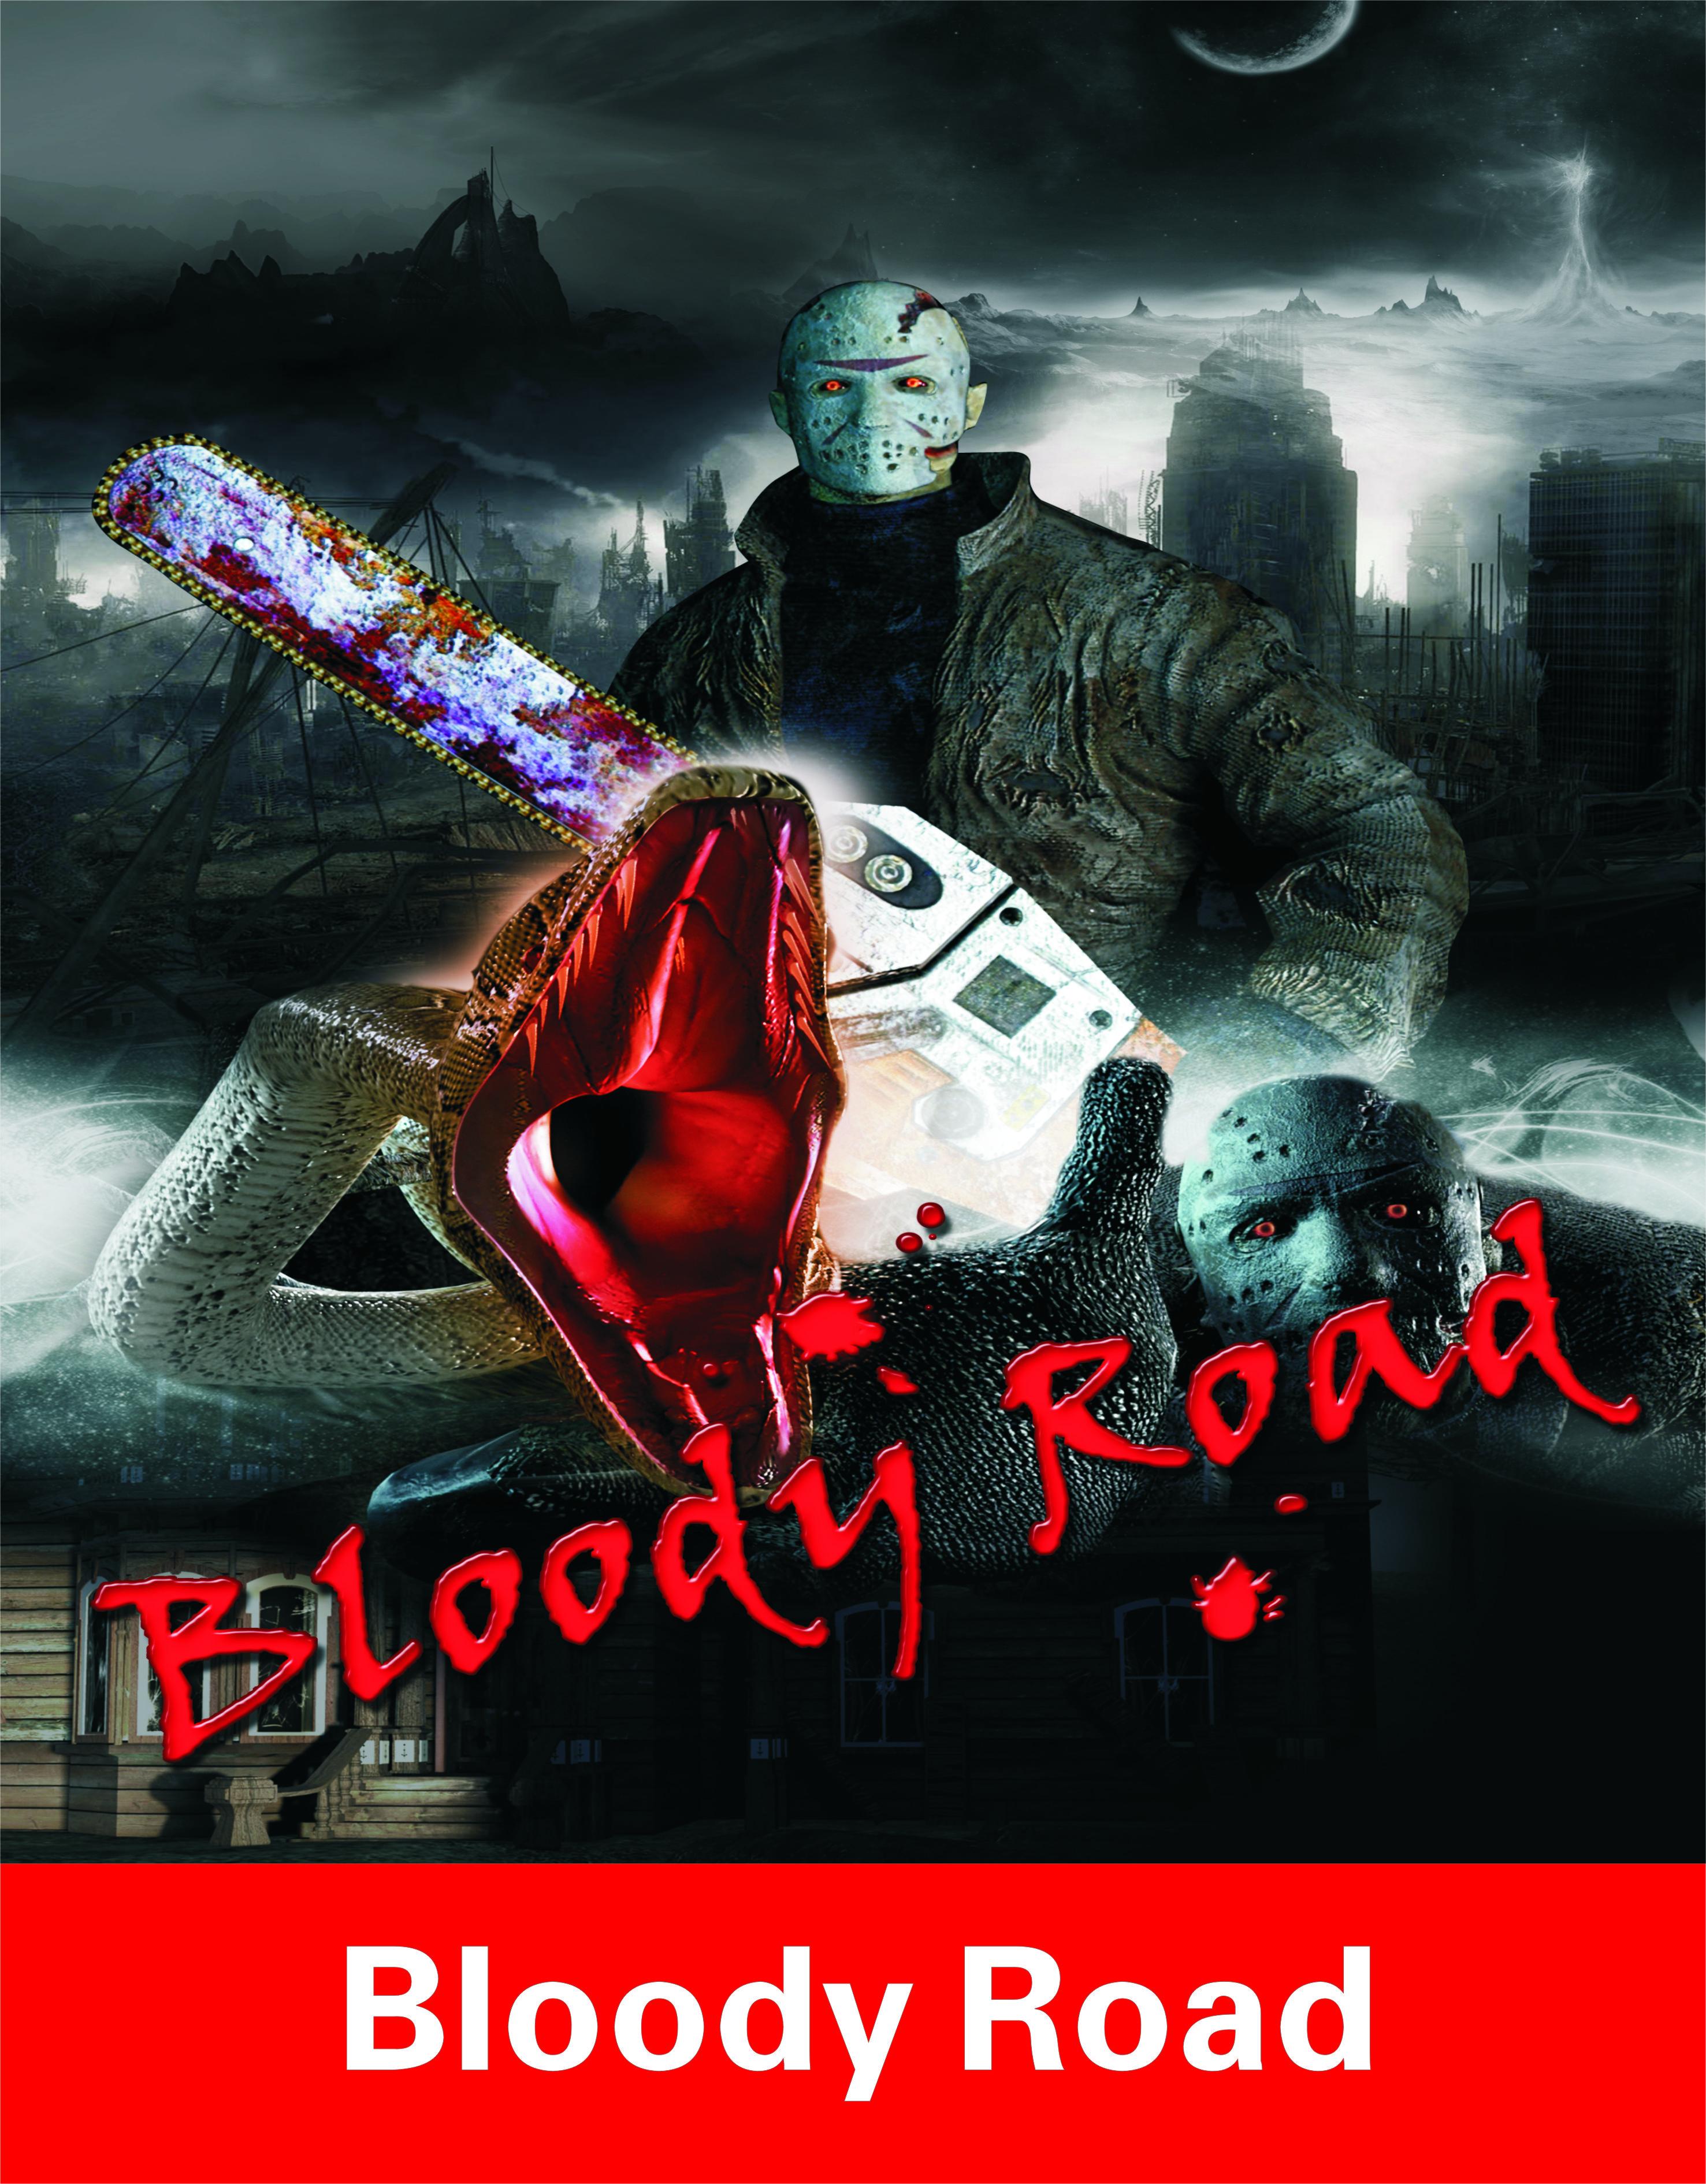 Bloody road 4D & 5D & 6D cinema movies